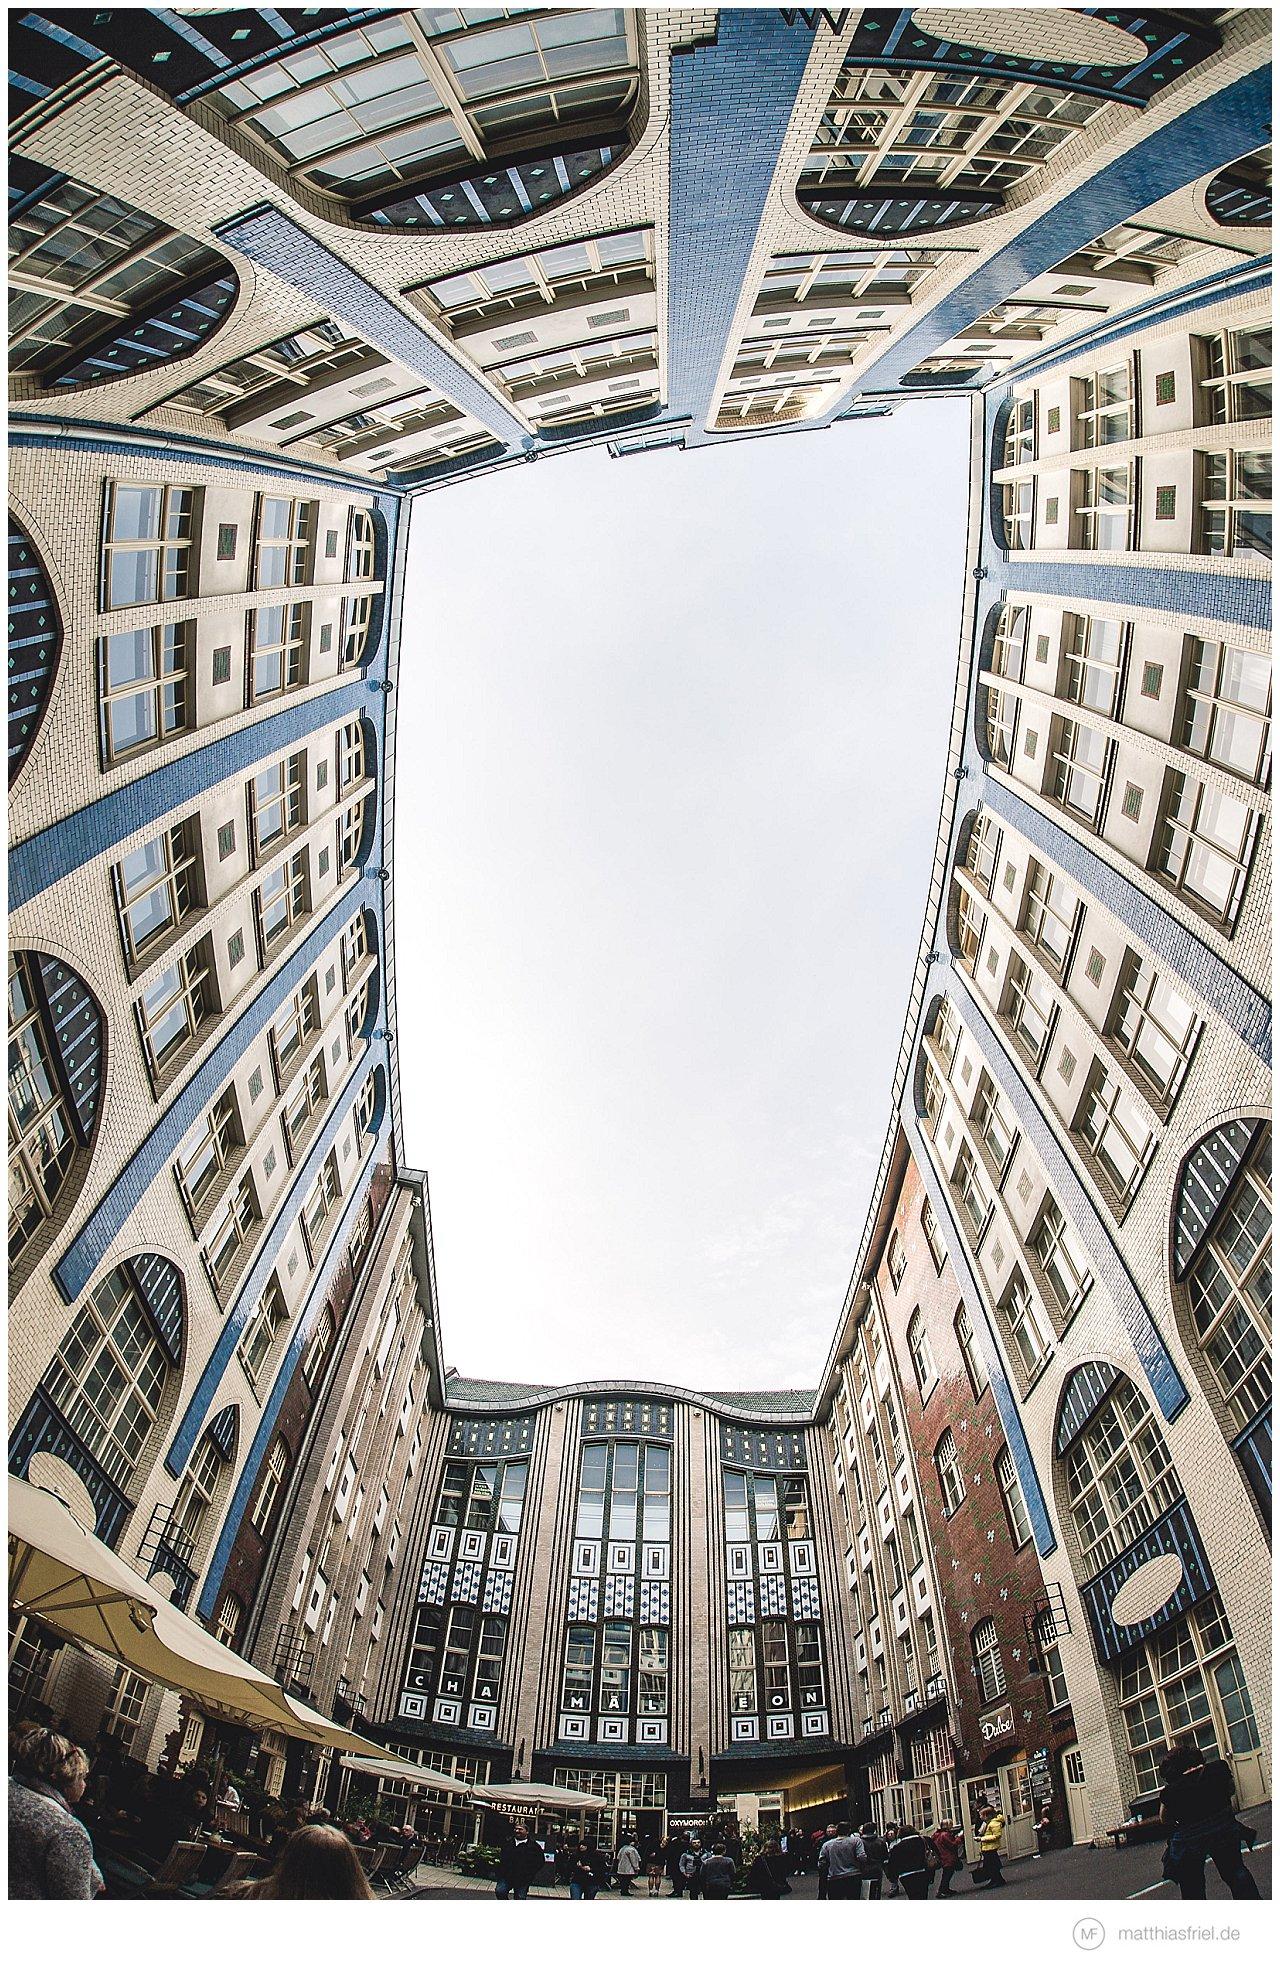 hochzeit-hotel-de-rome-sophienkirche-berlin-matthias-friel_0042